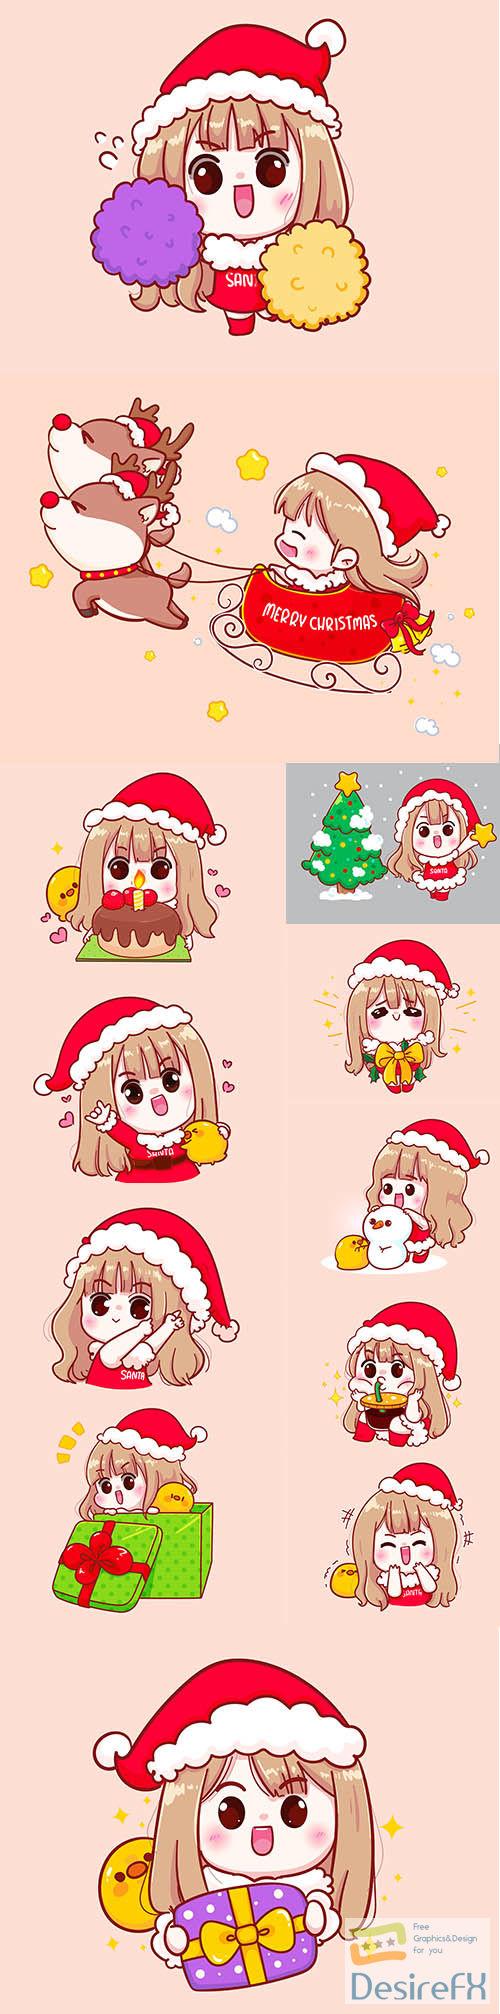 Cute girl in santa claus costume